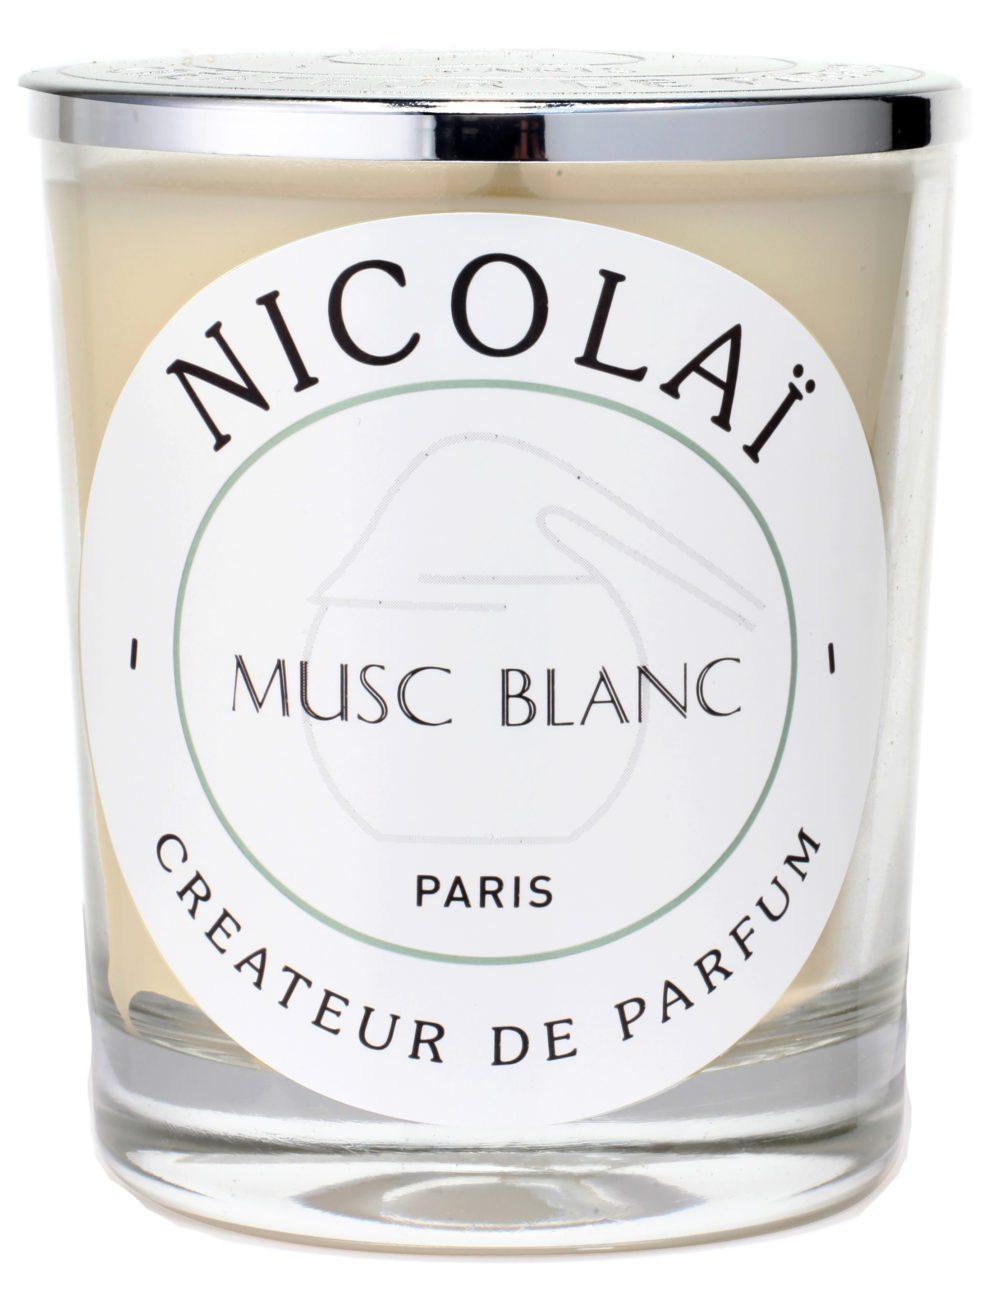 NICOLAI Musc Blanc